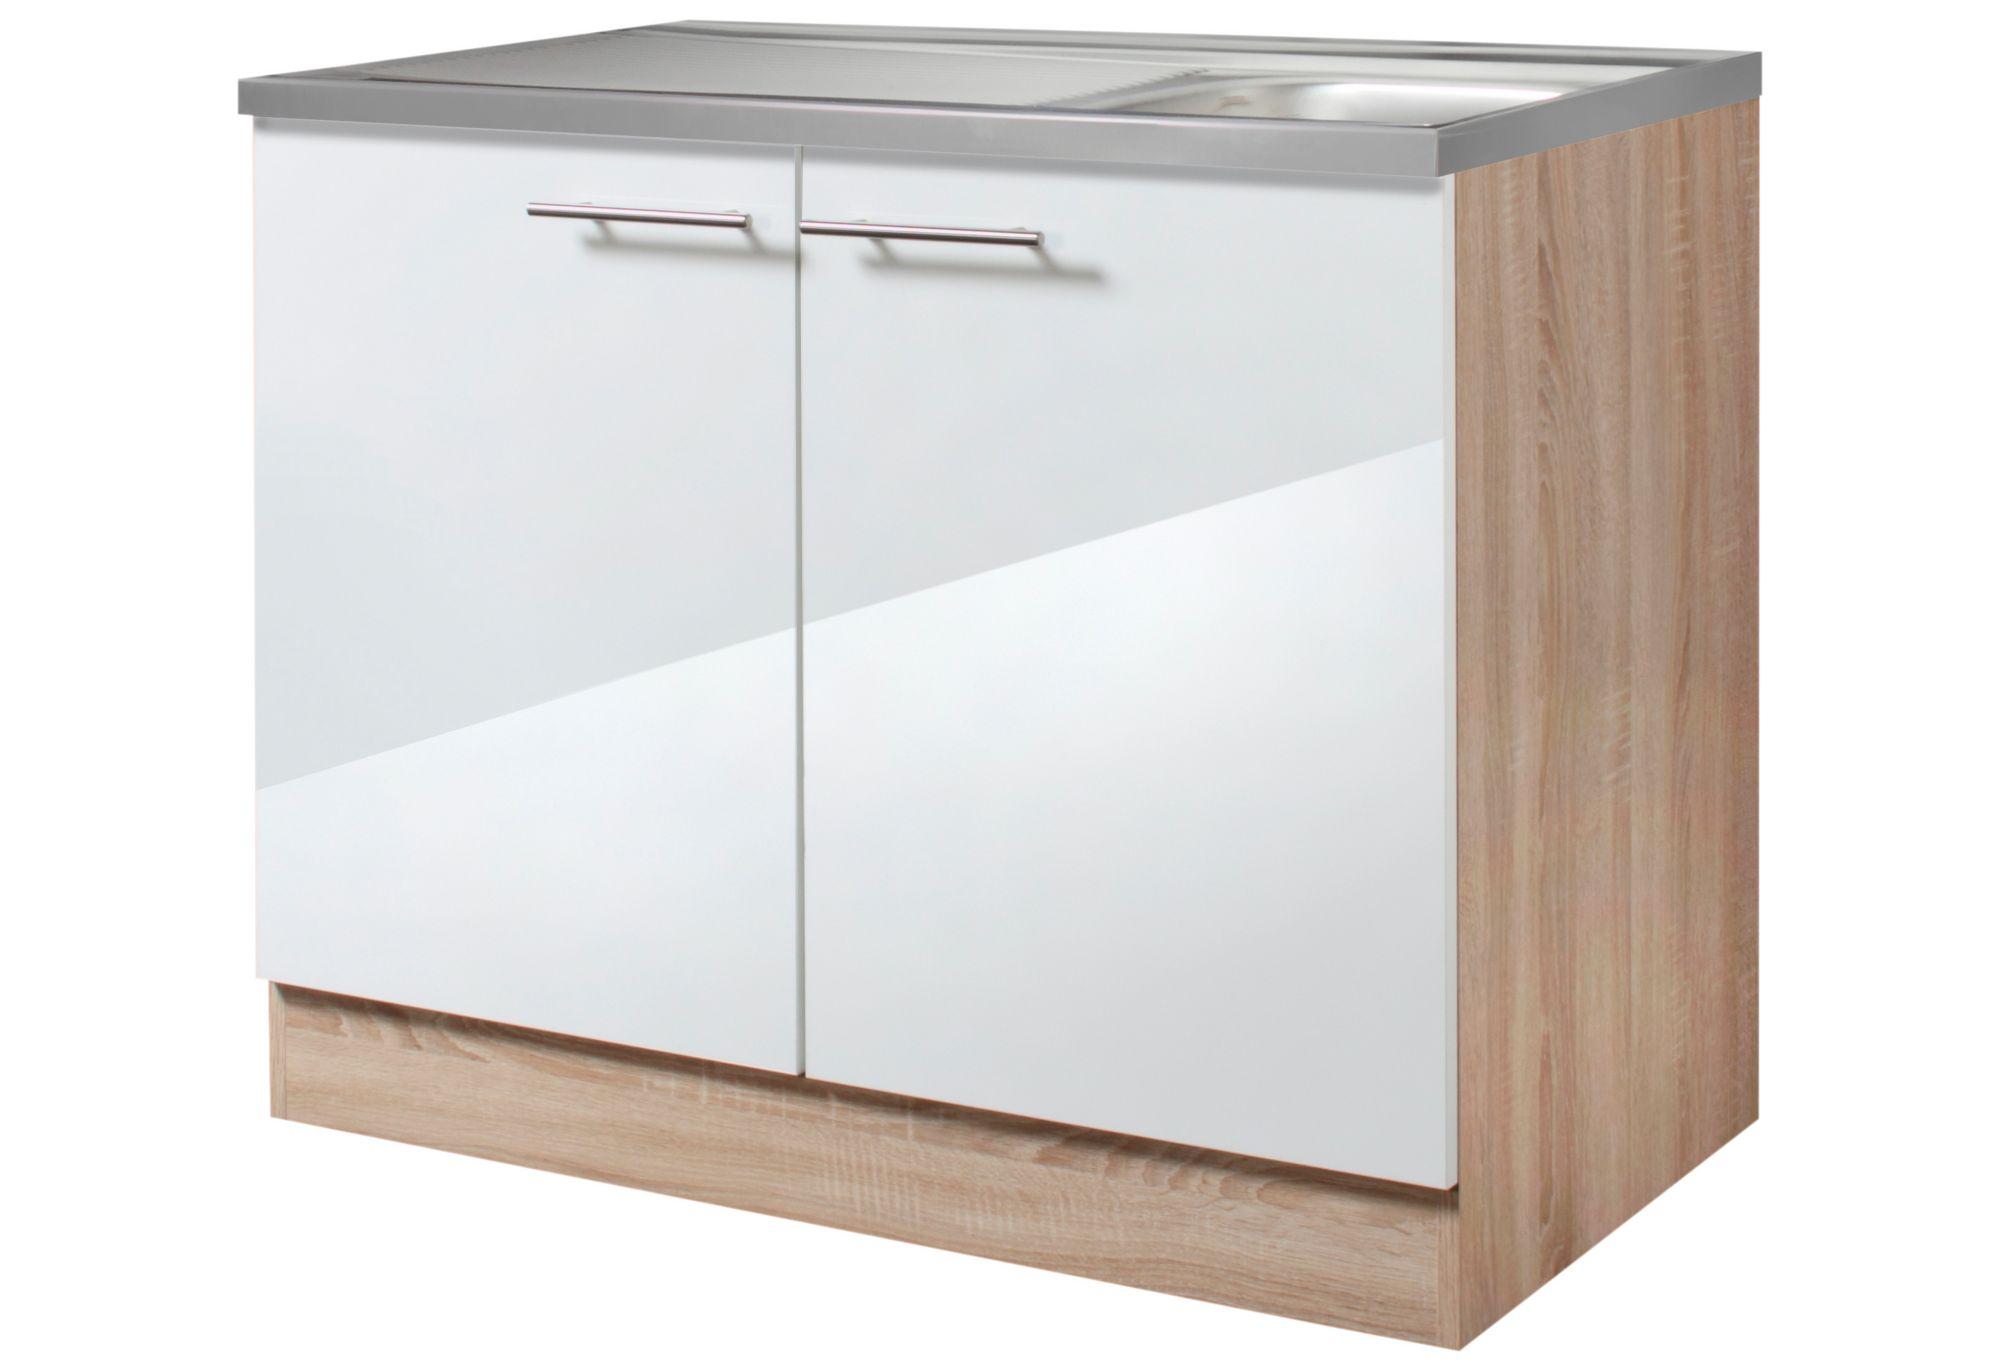 sp lenschrank dakar breite 100 cm schwab versand sp lenschr nke. Black Bedroom Furniture Sets. Home Design Ideas